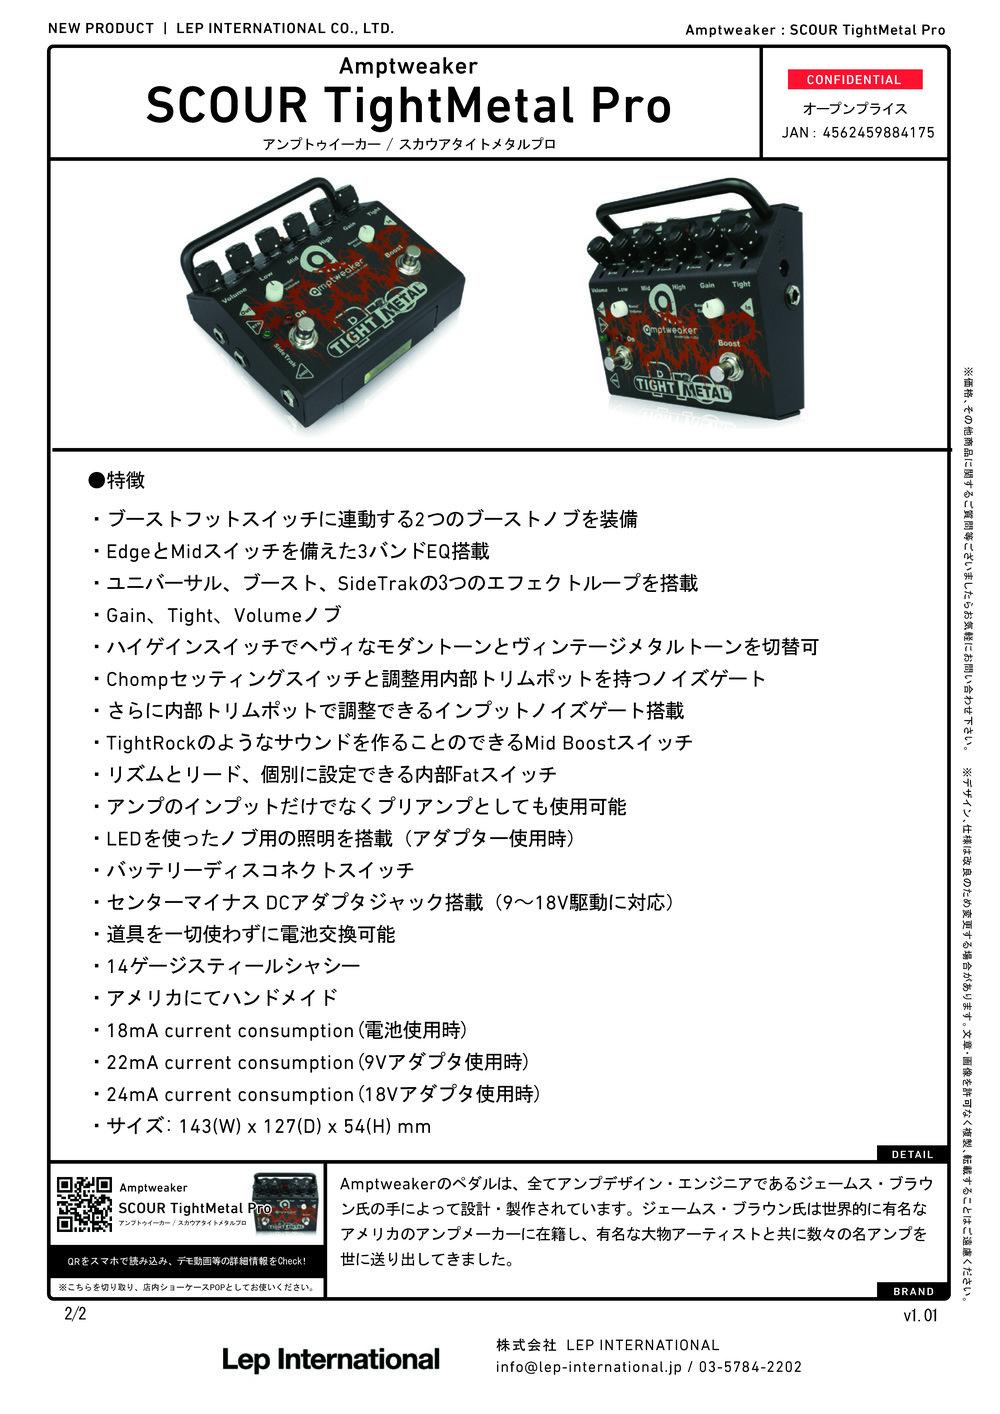 amptweaker scourtightmetalpro v1.01_ページ_2.jpg